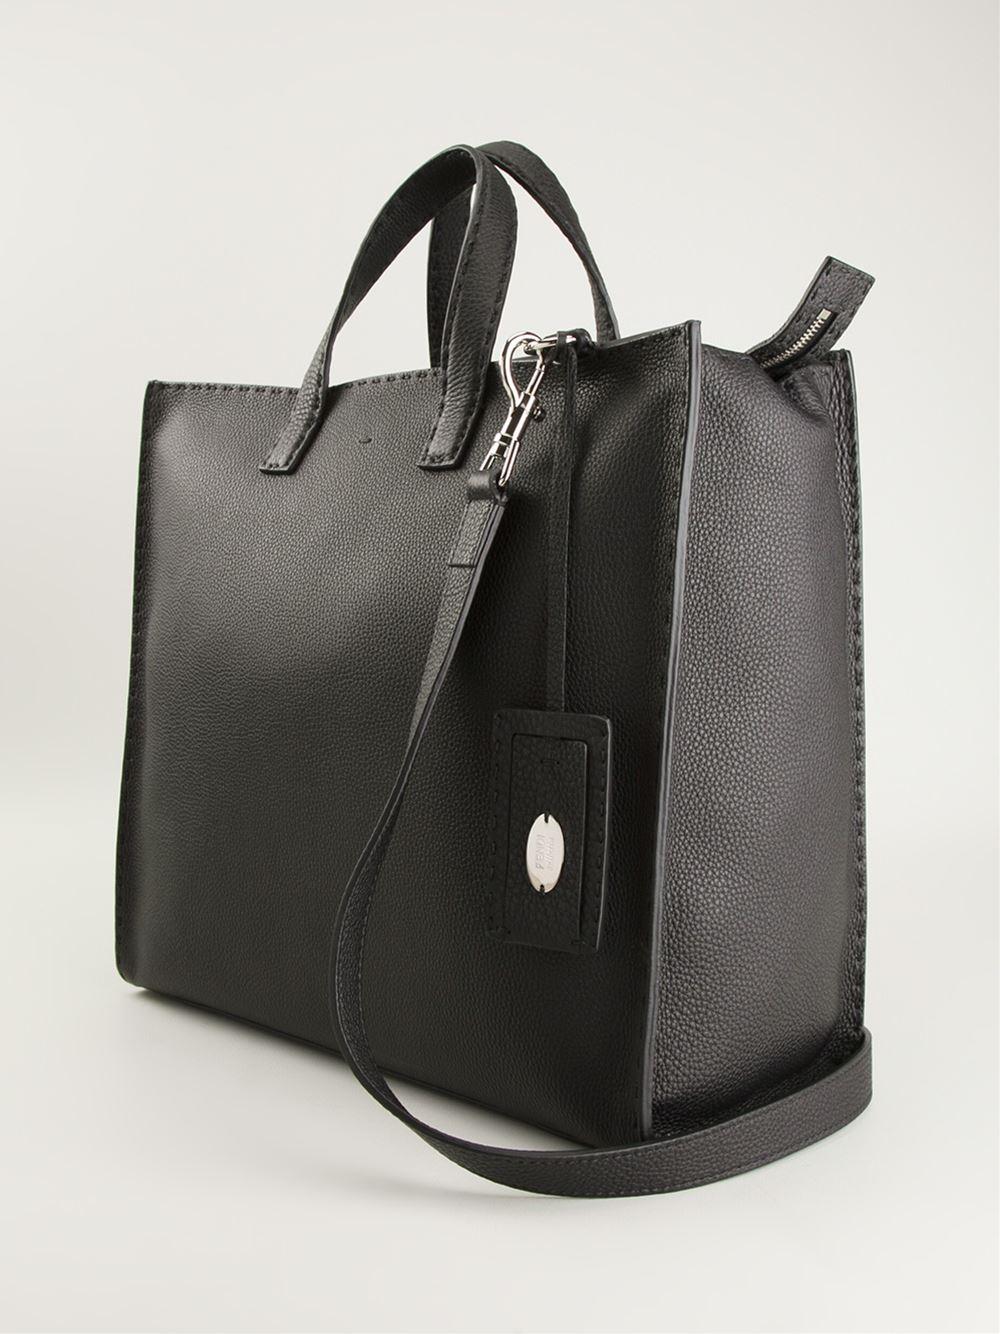 6ff14624f1e0 australia fendi fendi selleria tote bag shoulder bag photo a48241 c 6ac1b  2015a  low cost lyst fendi selleria tote in black for men 2494d f77eb